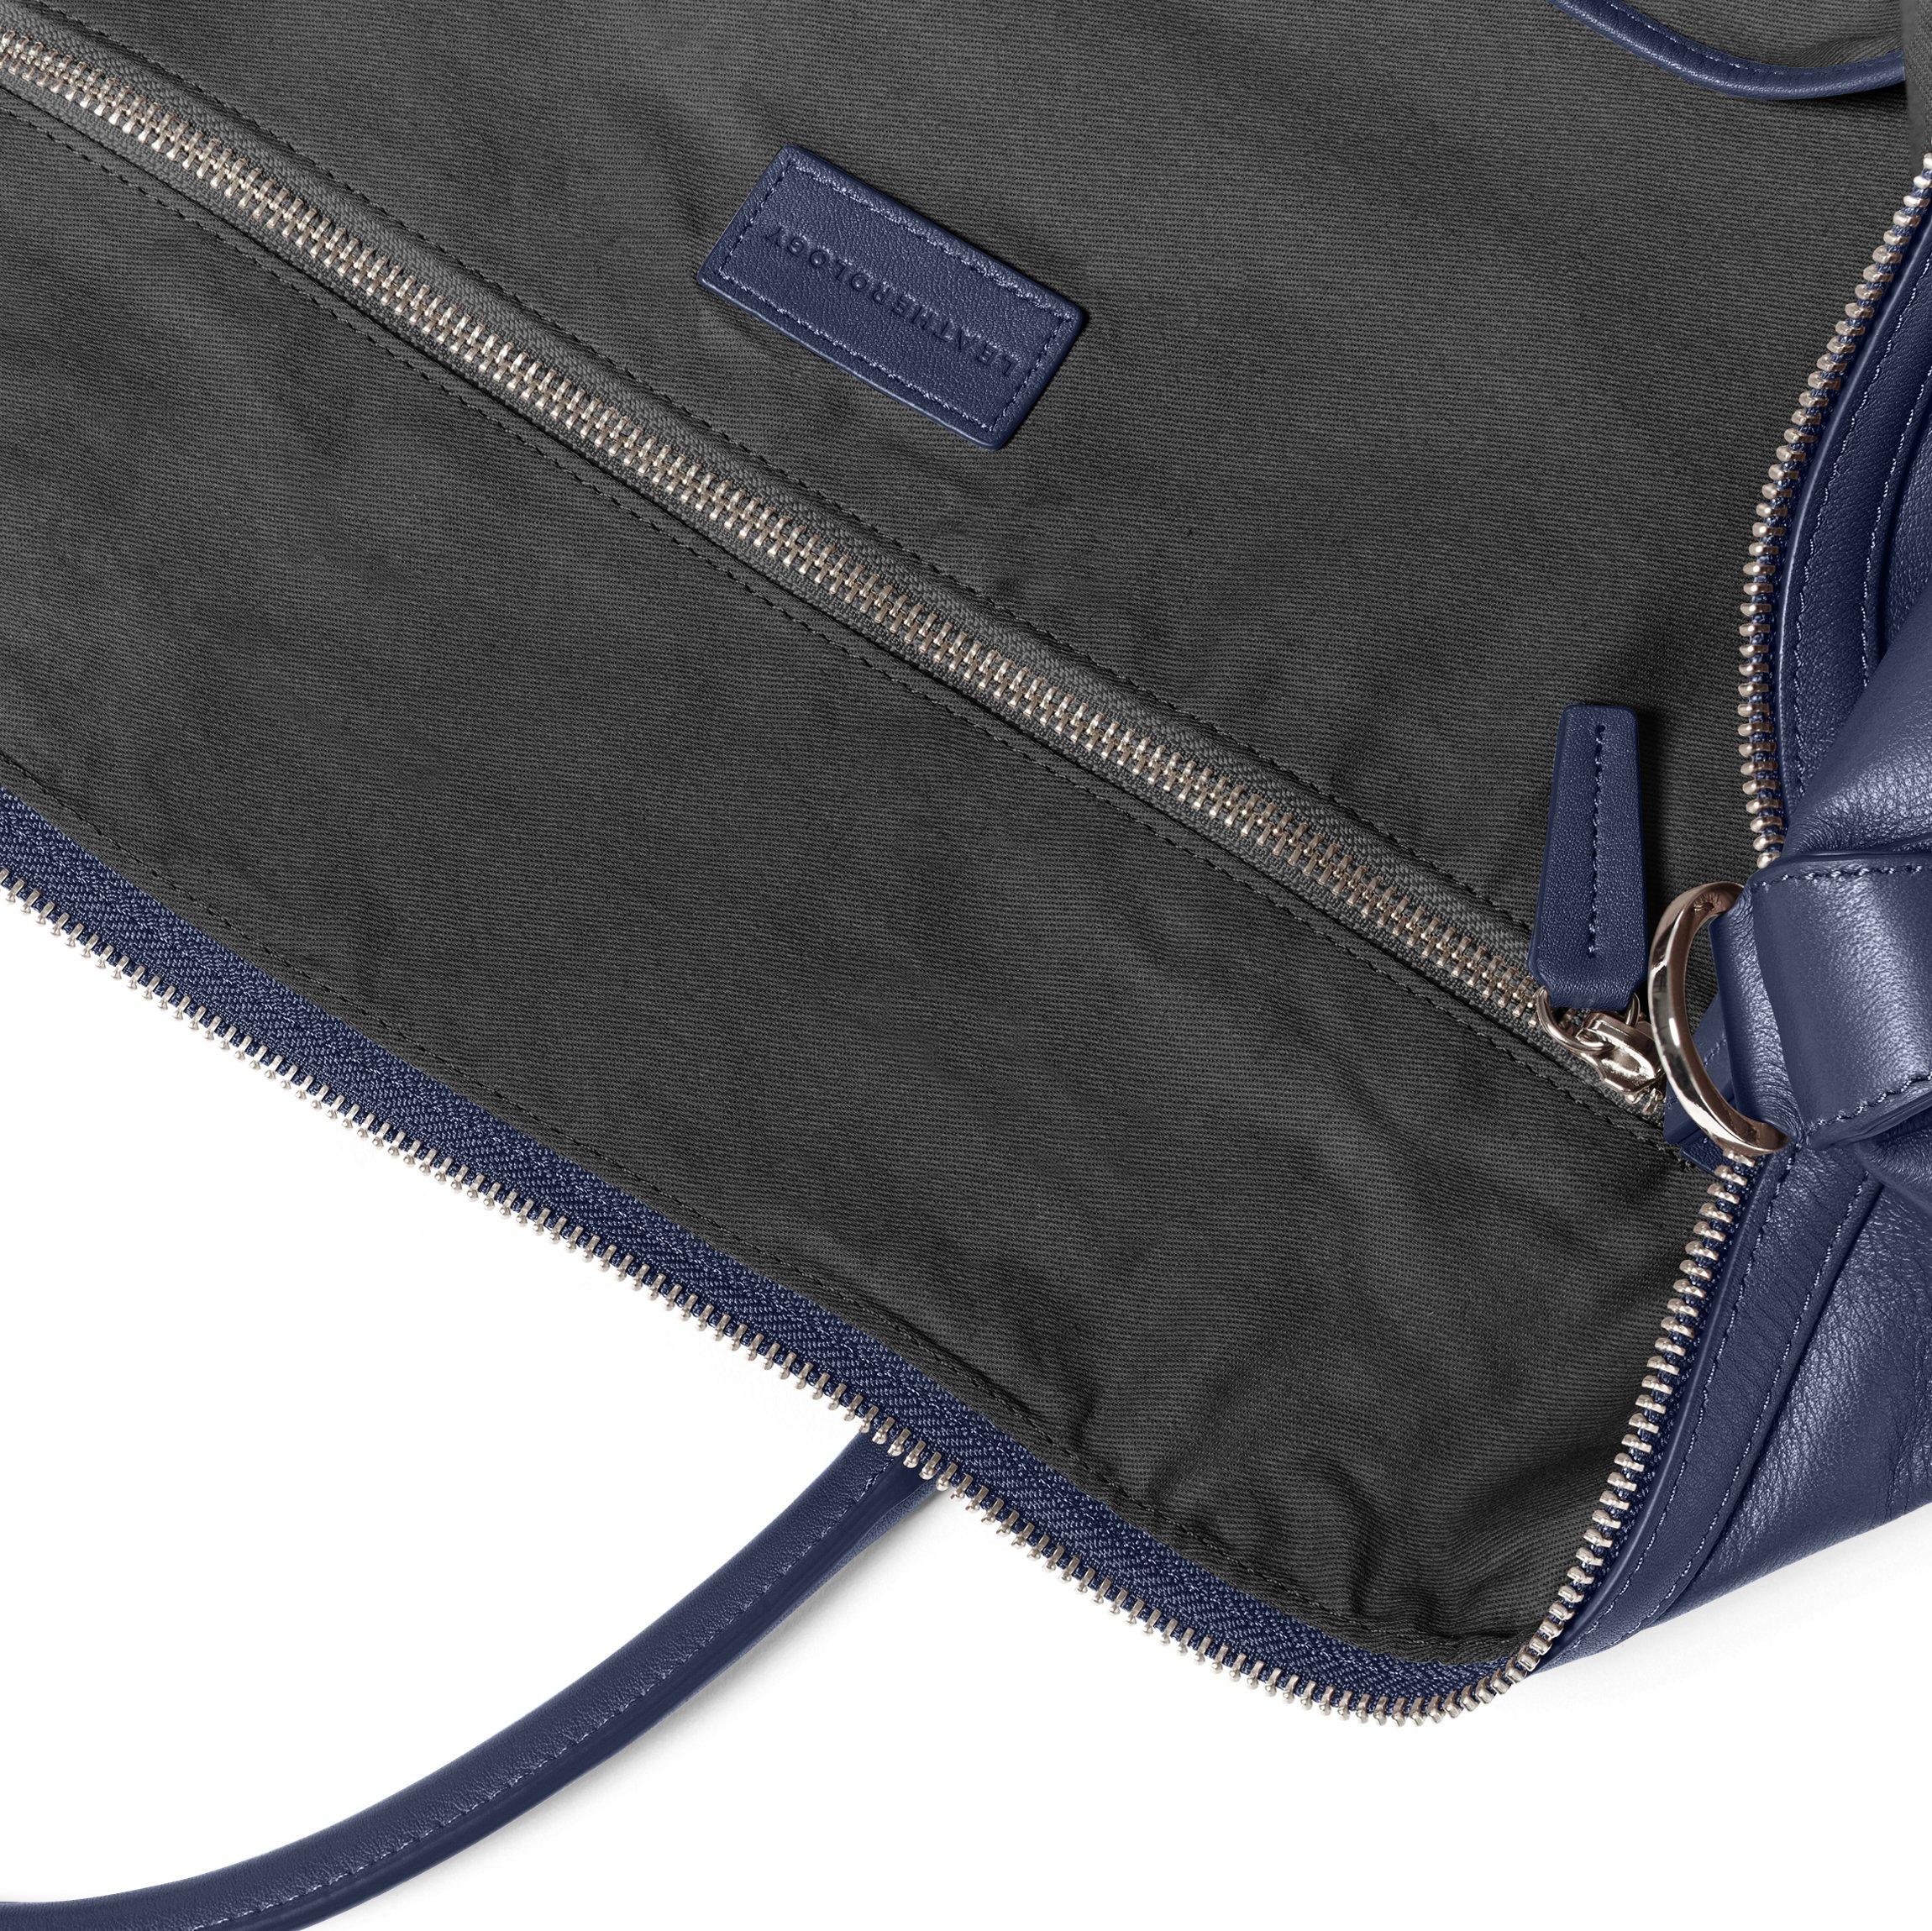 Kessler Medium Duffle - Full Grain Leather Leather - Navy (blue) by Leatherology (Image #3)